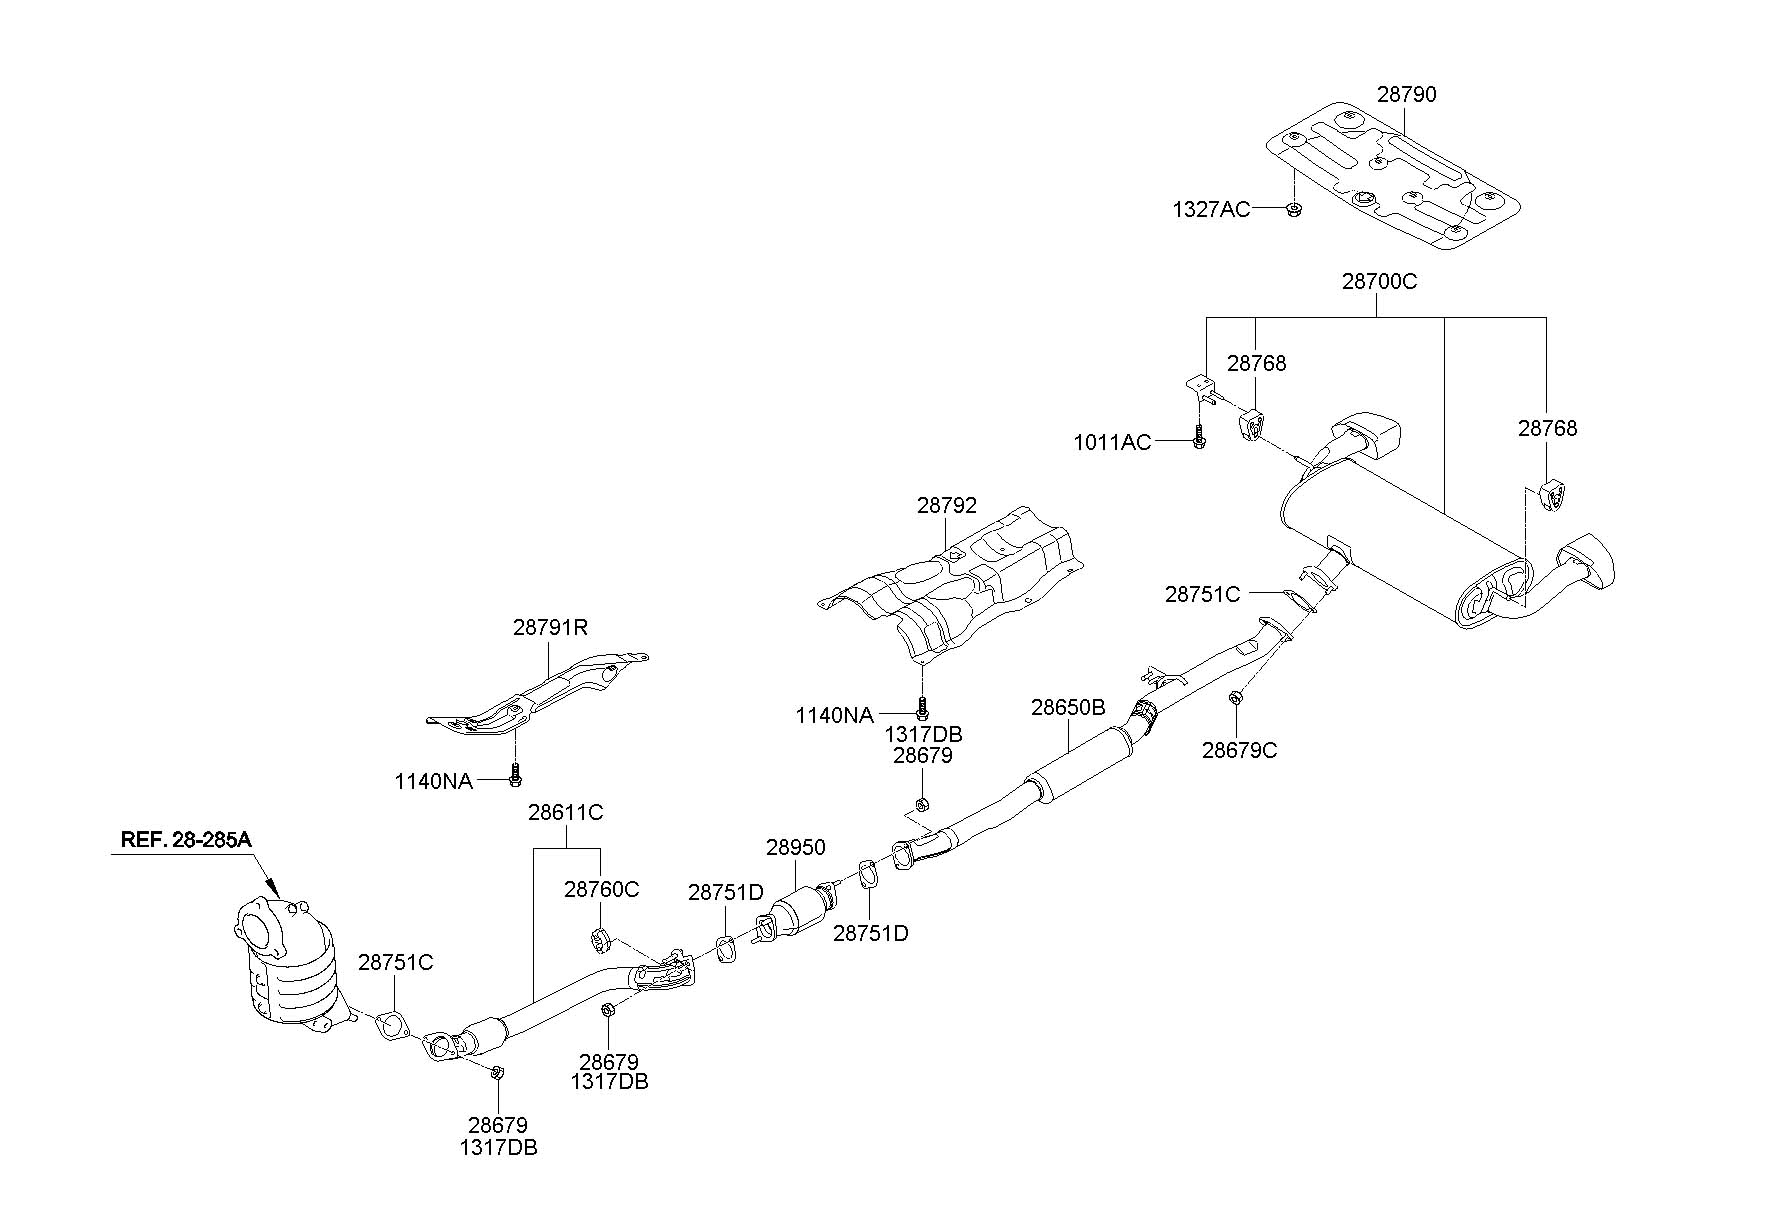 287613K000 - Hyundai Muffler AND pipe hanger. Included ...